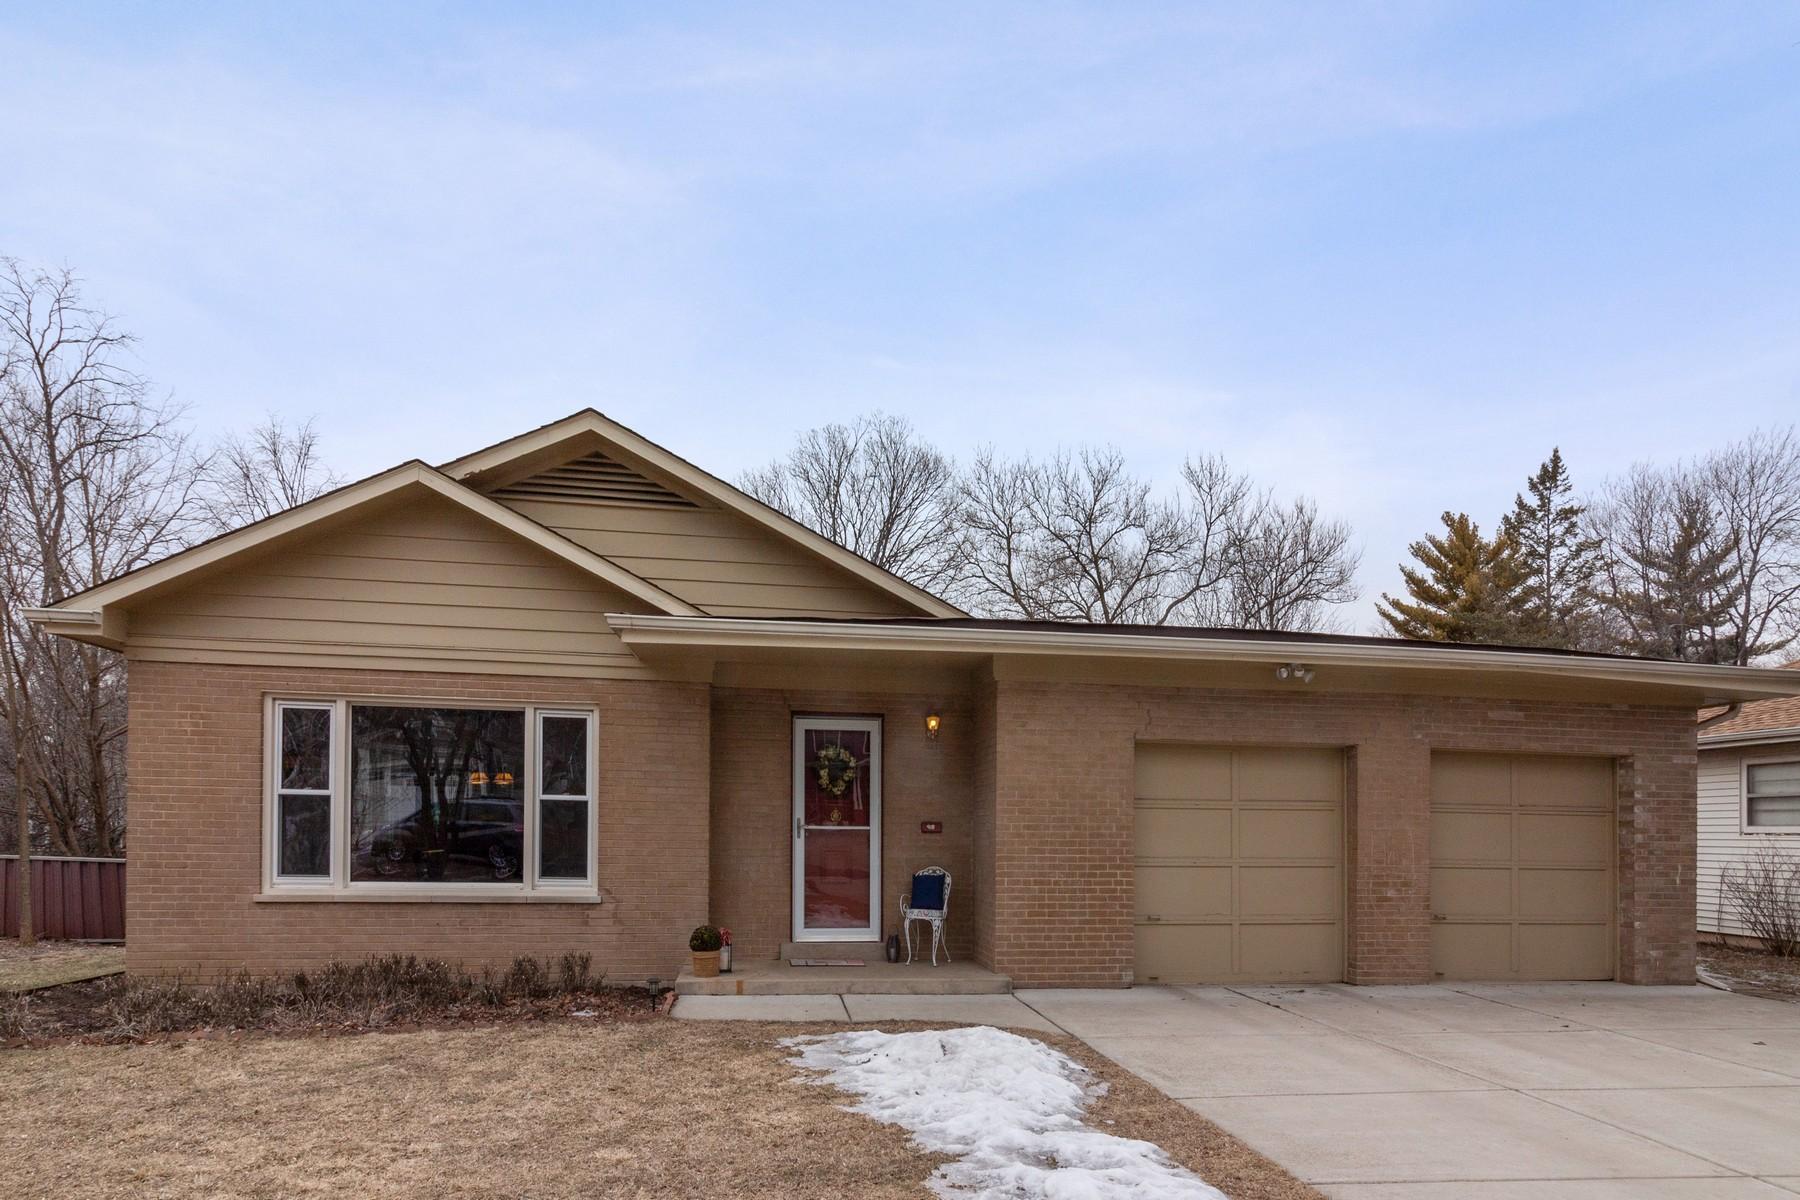 Single Family Home for Sale at Gorgeous Wheaton Split Level Home 918 Delles Road Wheaton, Illinois 60189 United States